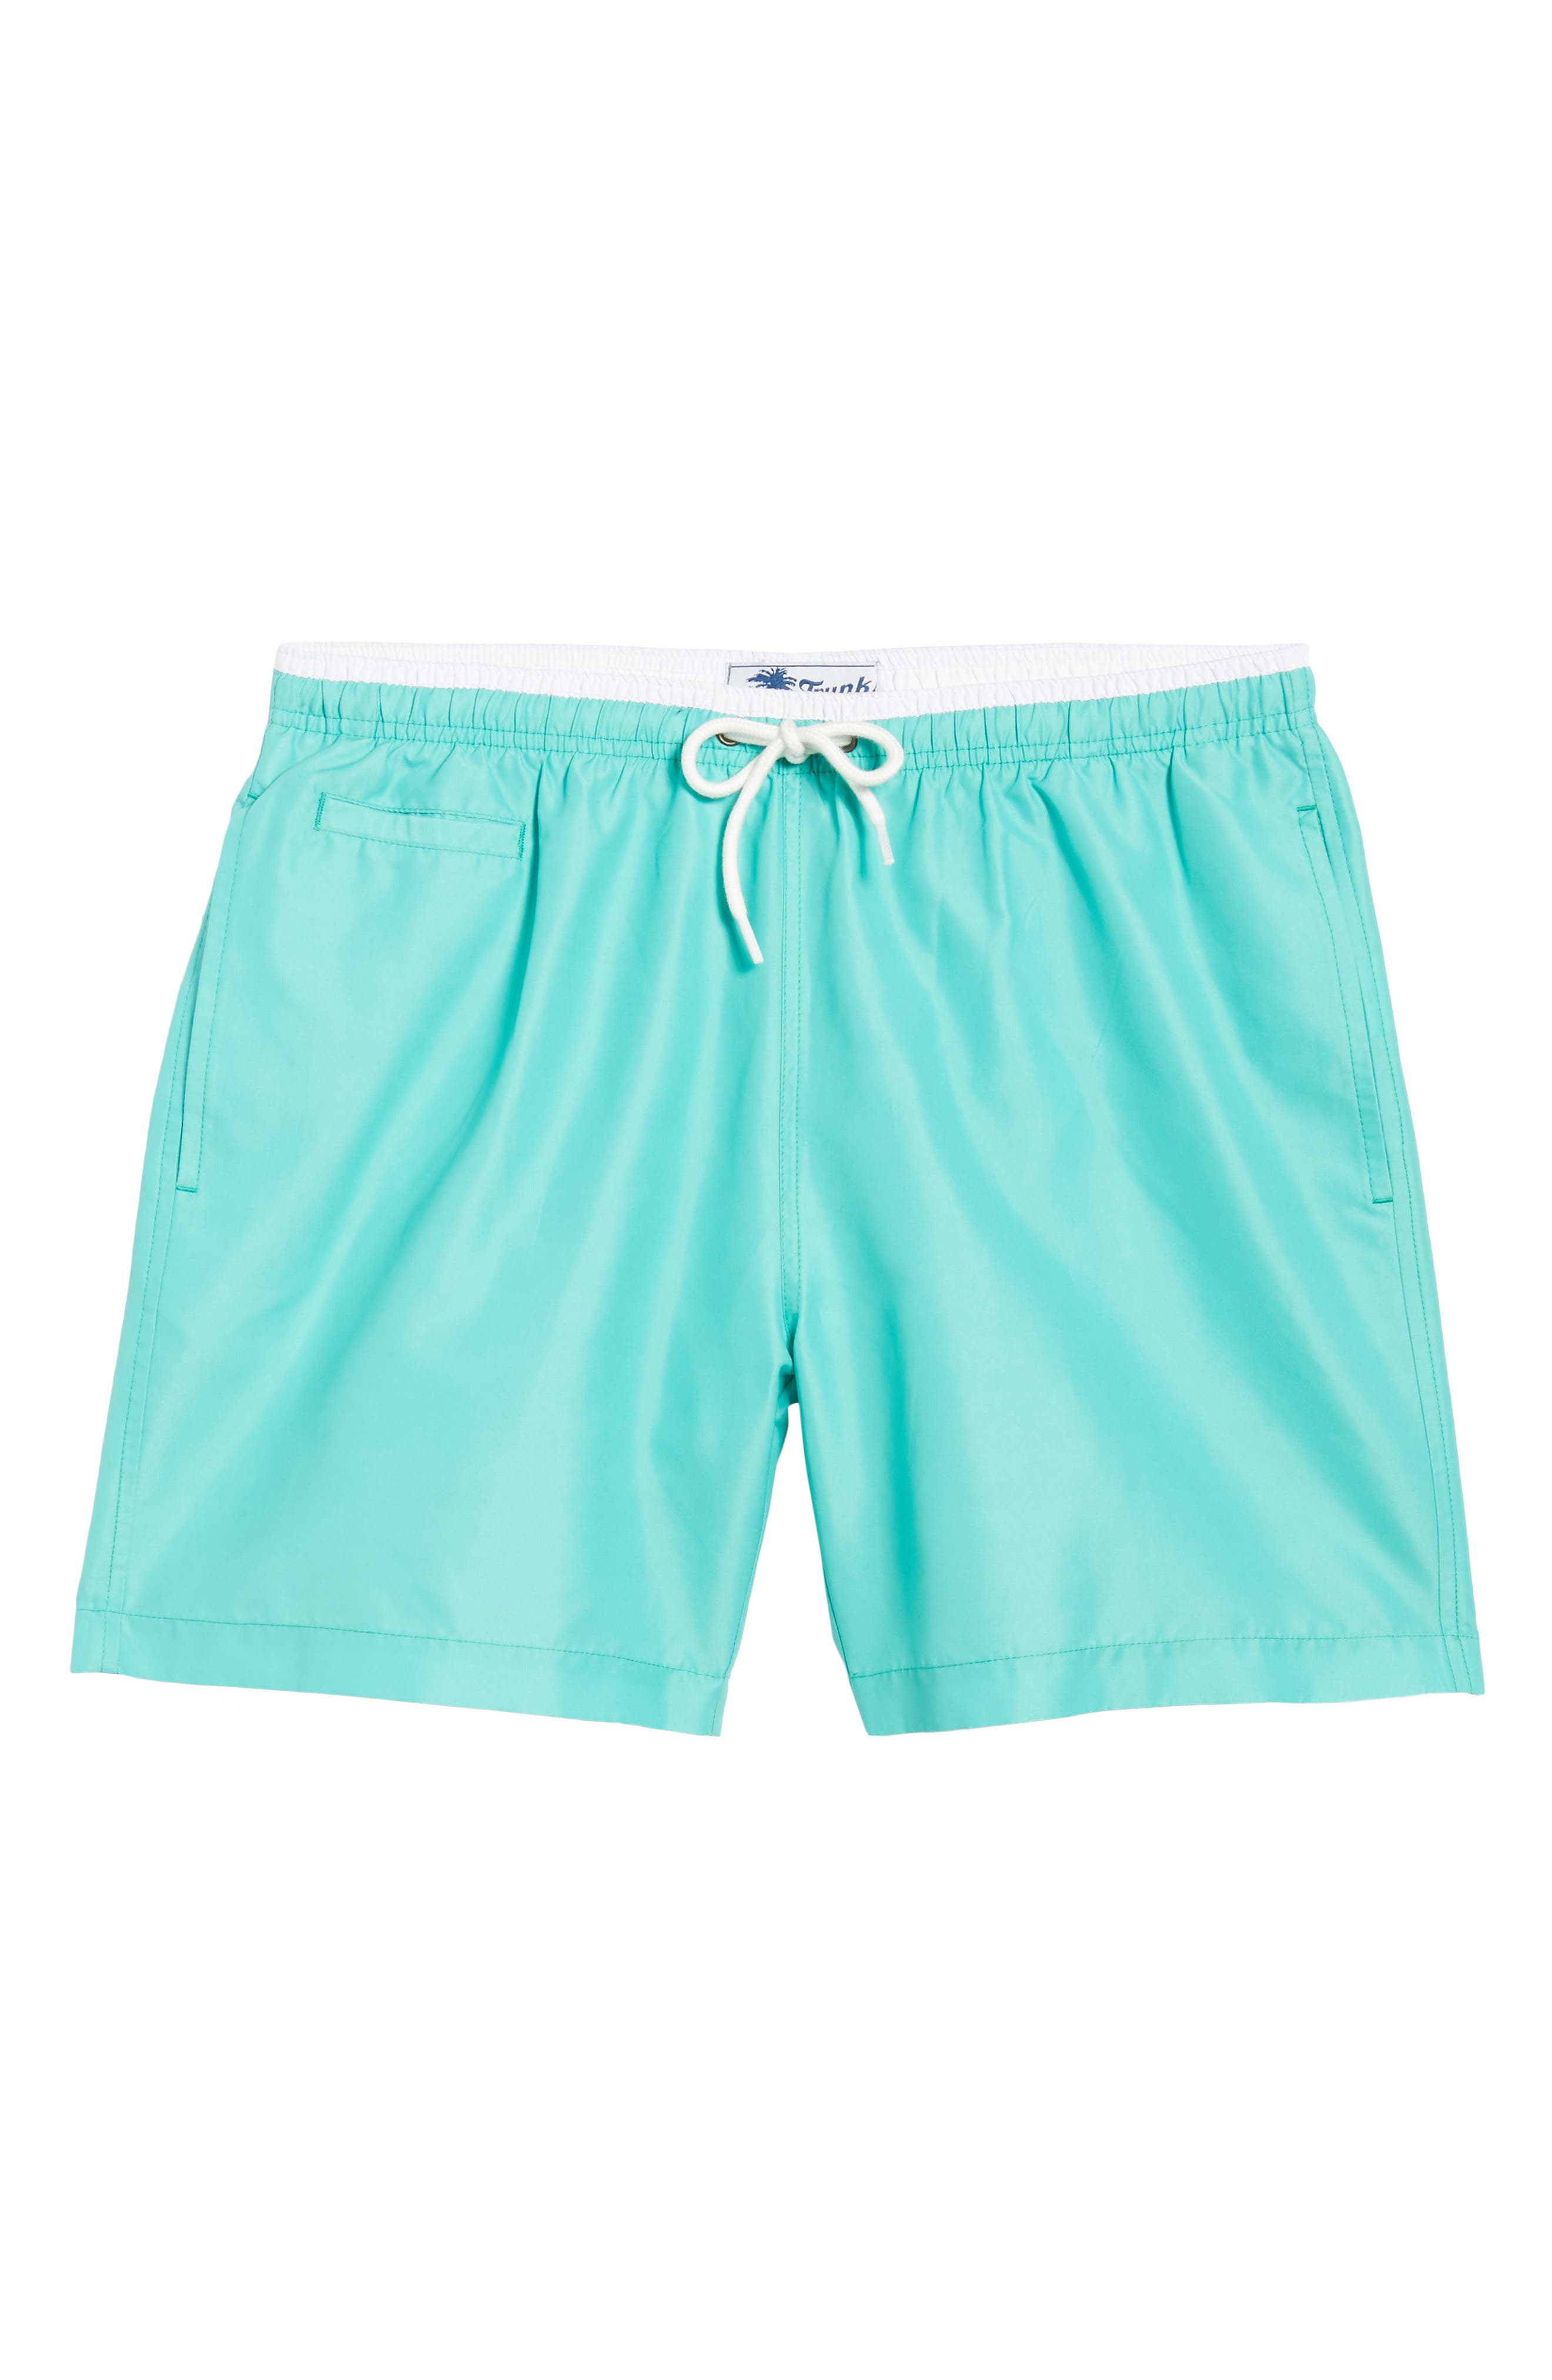 San O Swim Trunks,                             Alternate thumbnail 6, color,                             Sea Green/ White